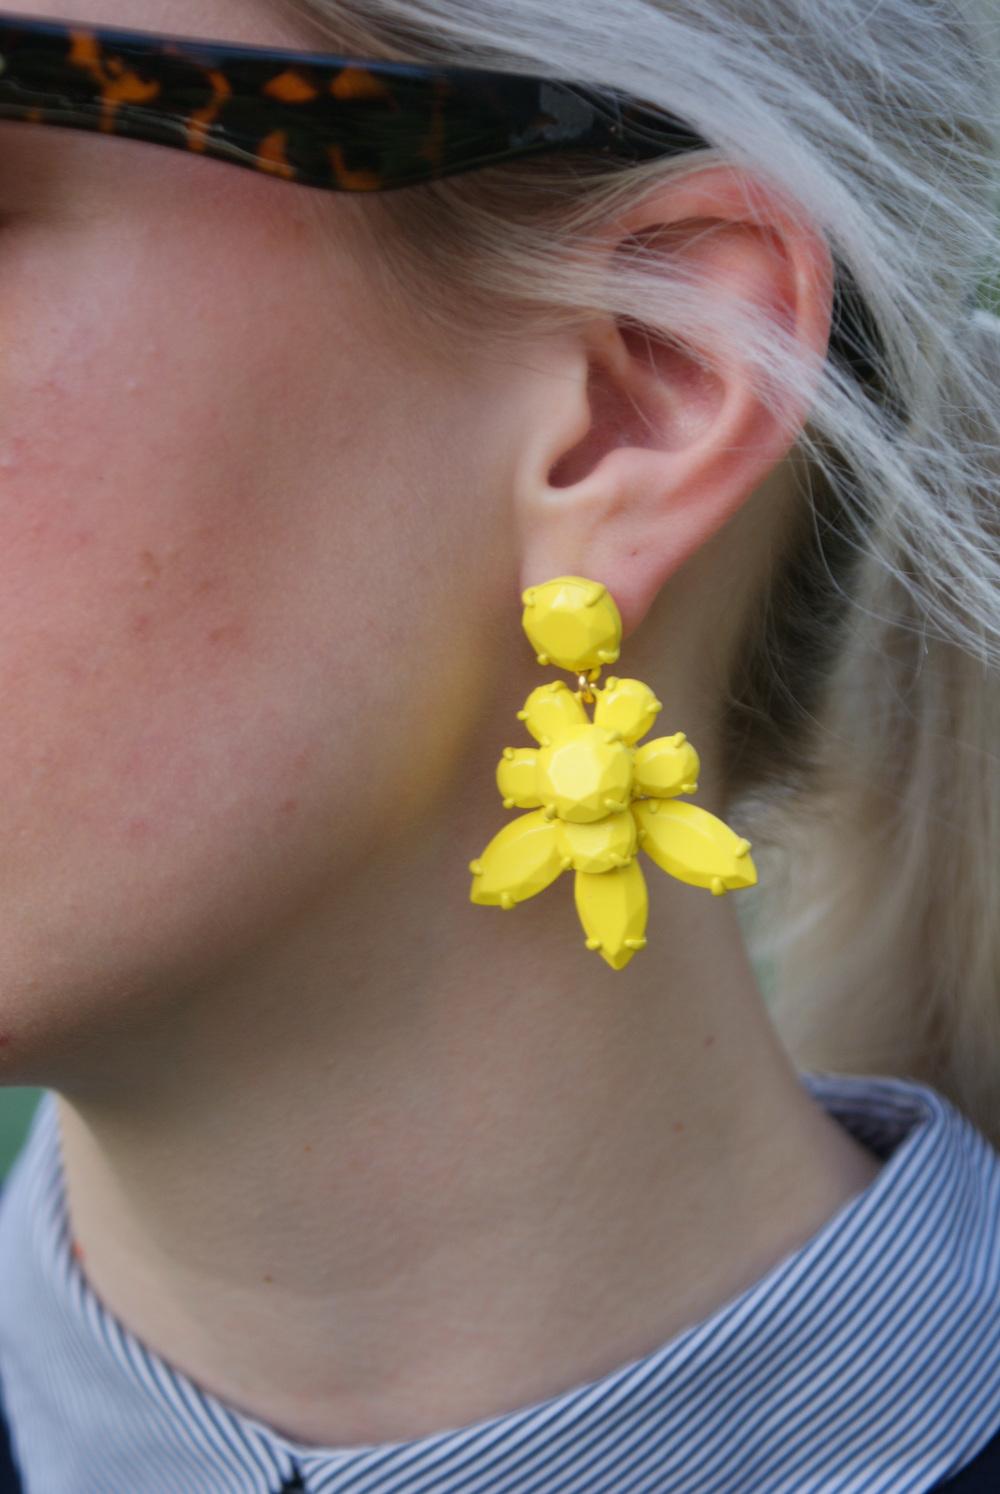 Zara navy preppy dress, loeffler randall rider bag, J.Crew addie loafers, J.Crew yellow statement earrings